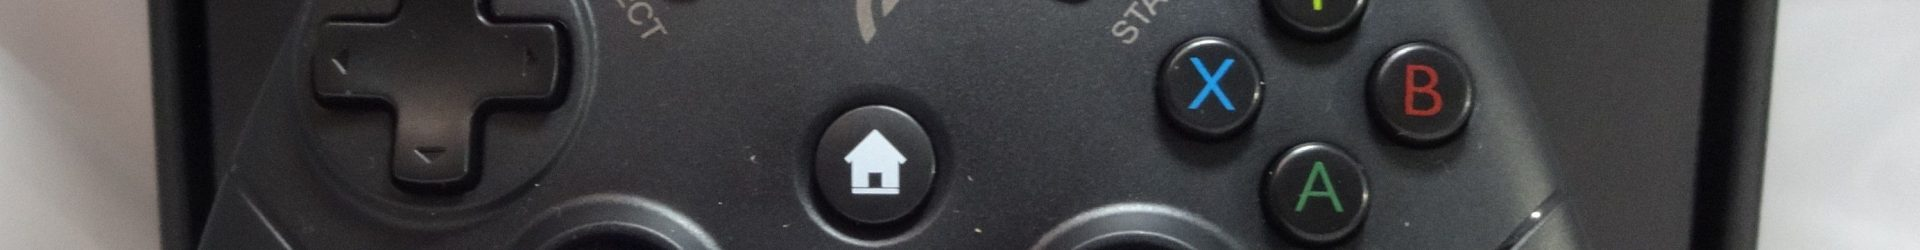 Recensione EasySMX EG-C3071: gamepad per PS3, device Android e Windows